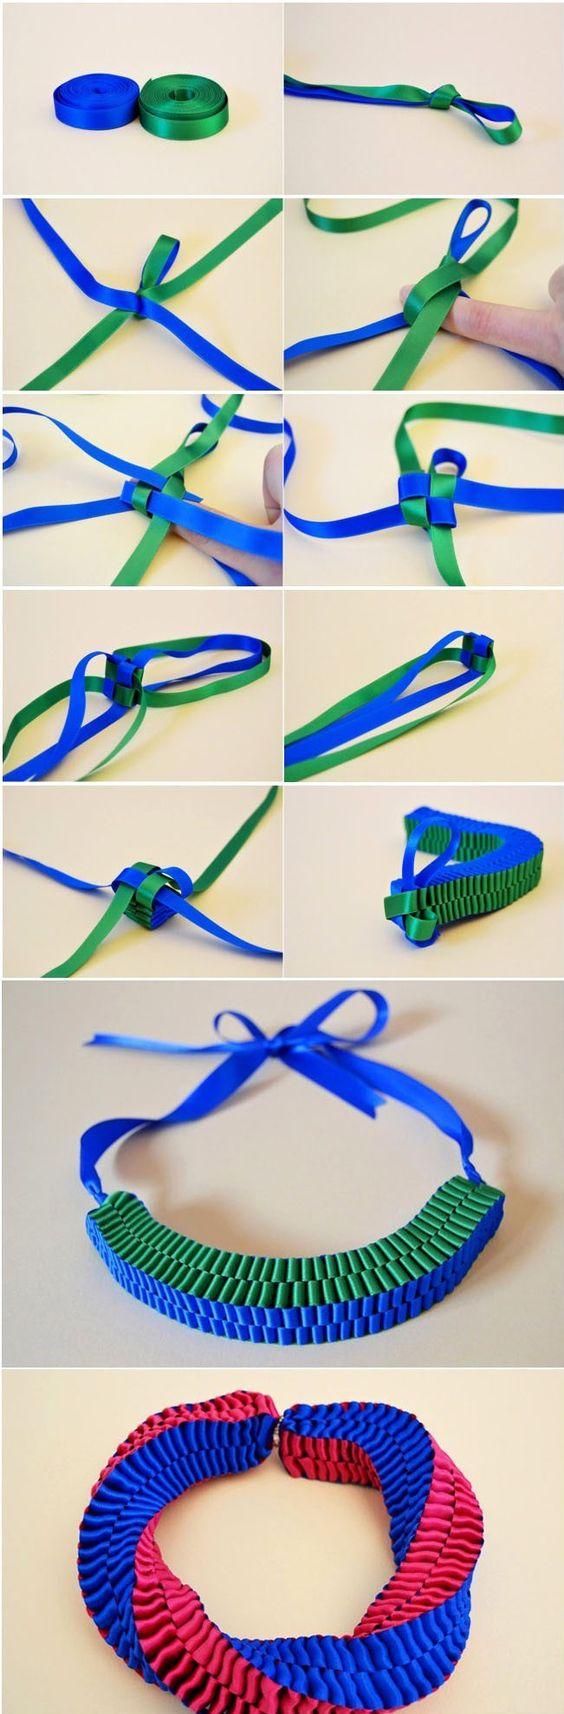 DIY - Interesting Easy Craft Ideas / Hoe heette die techniek ook al weer? Jaar of 10 geleden actueel met soort plastic slangetjes..........: